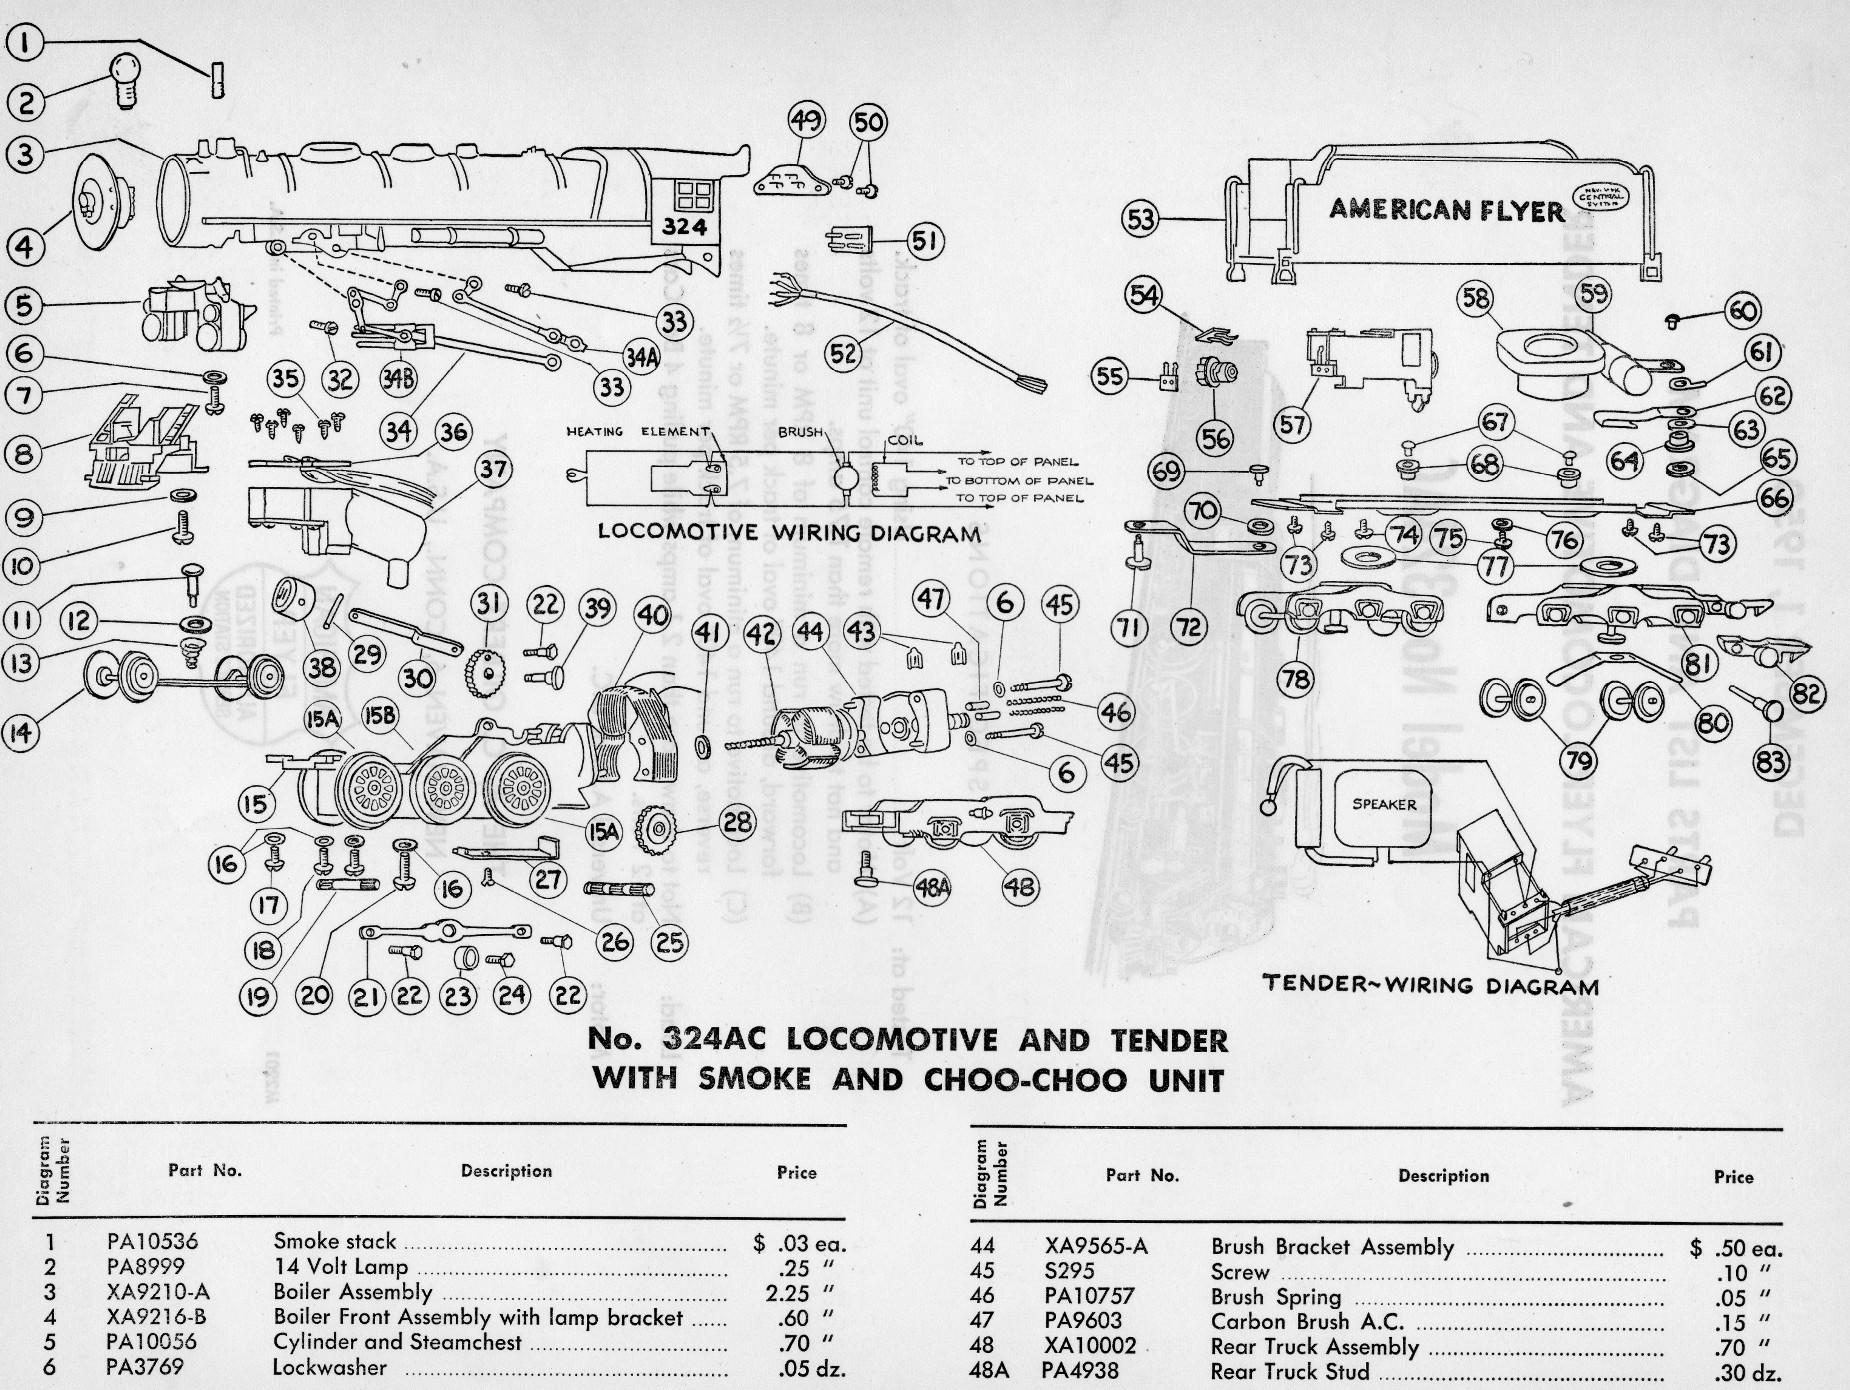 American Flyer Diagram 1950 Hudson Wiring Locomotive 324ac Parts List And Traindr